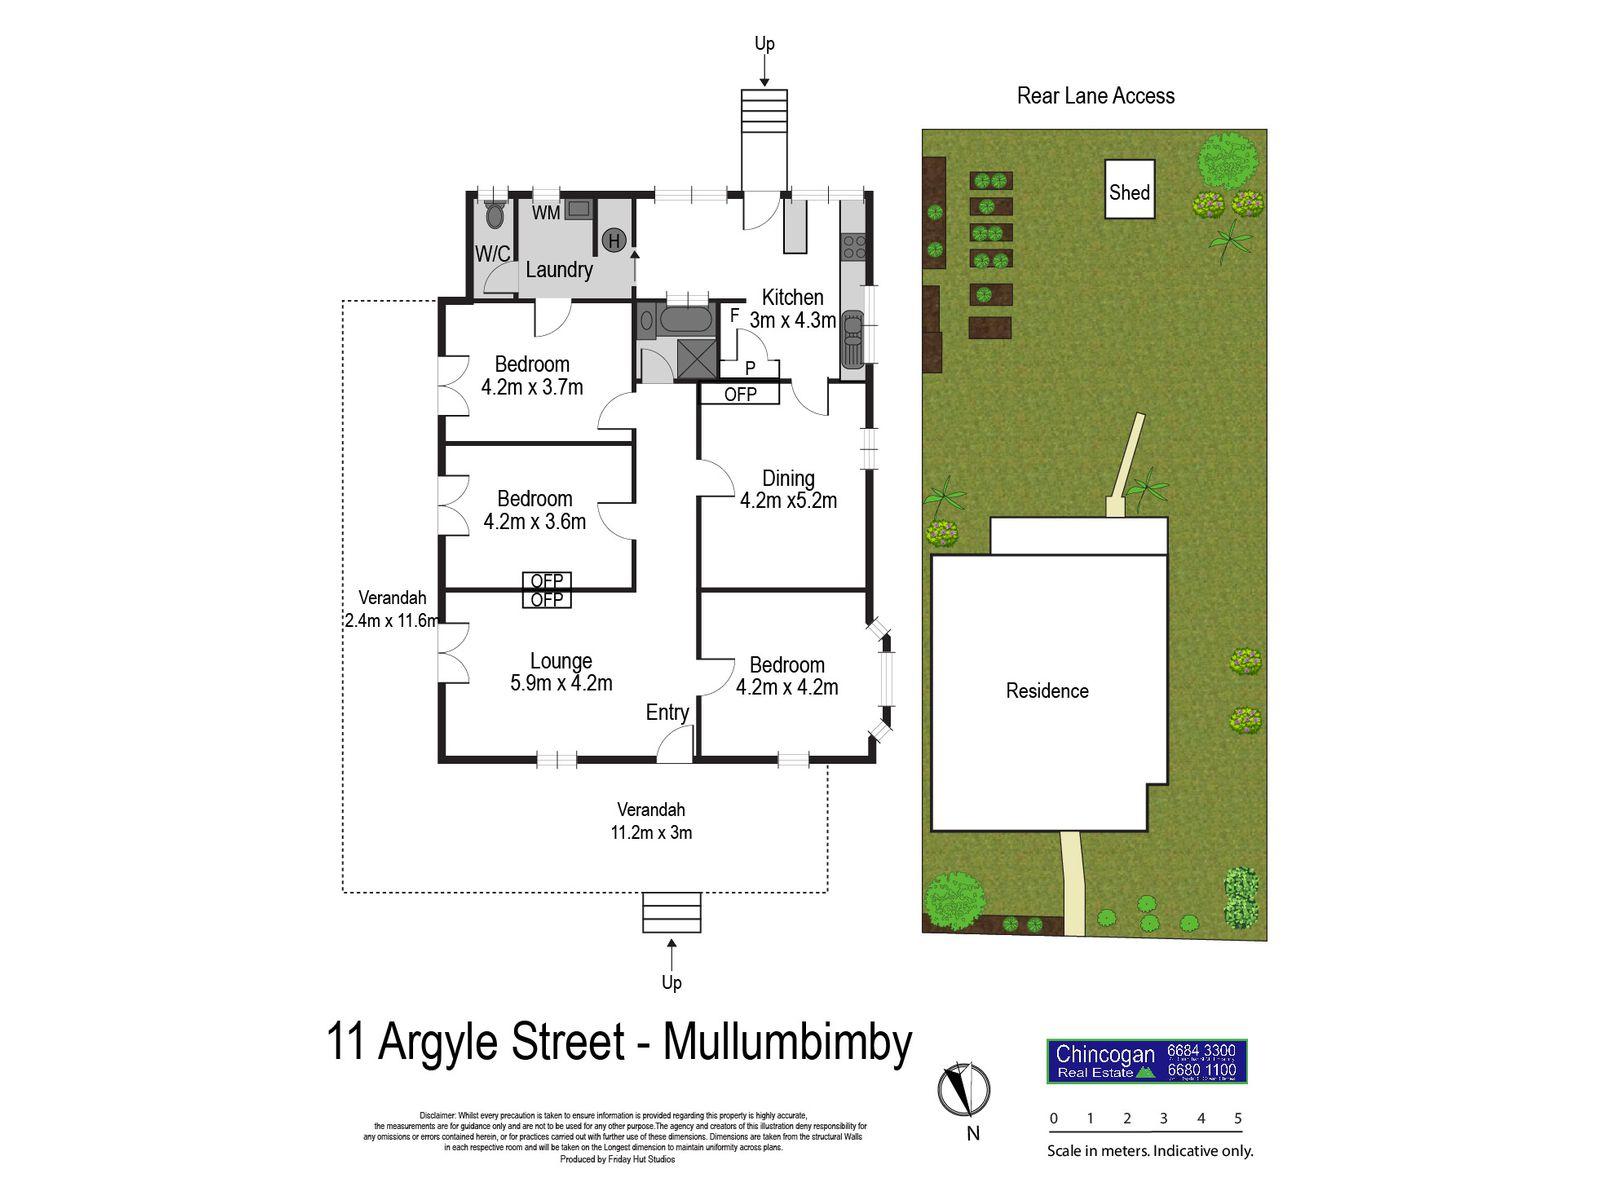 11 Argyle Street, Mullumbimby